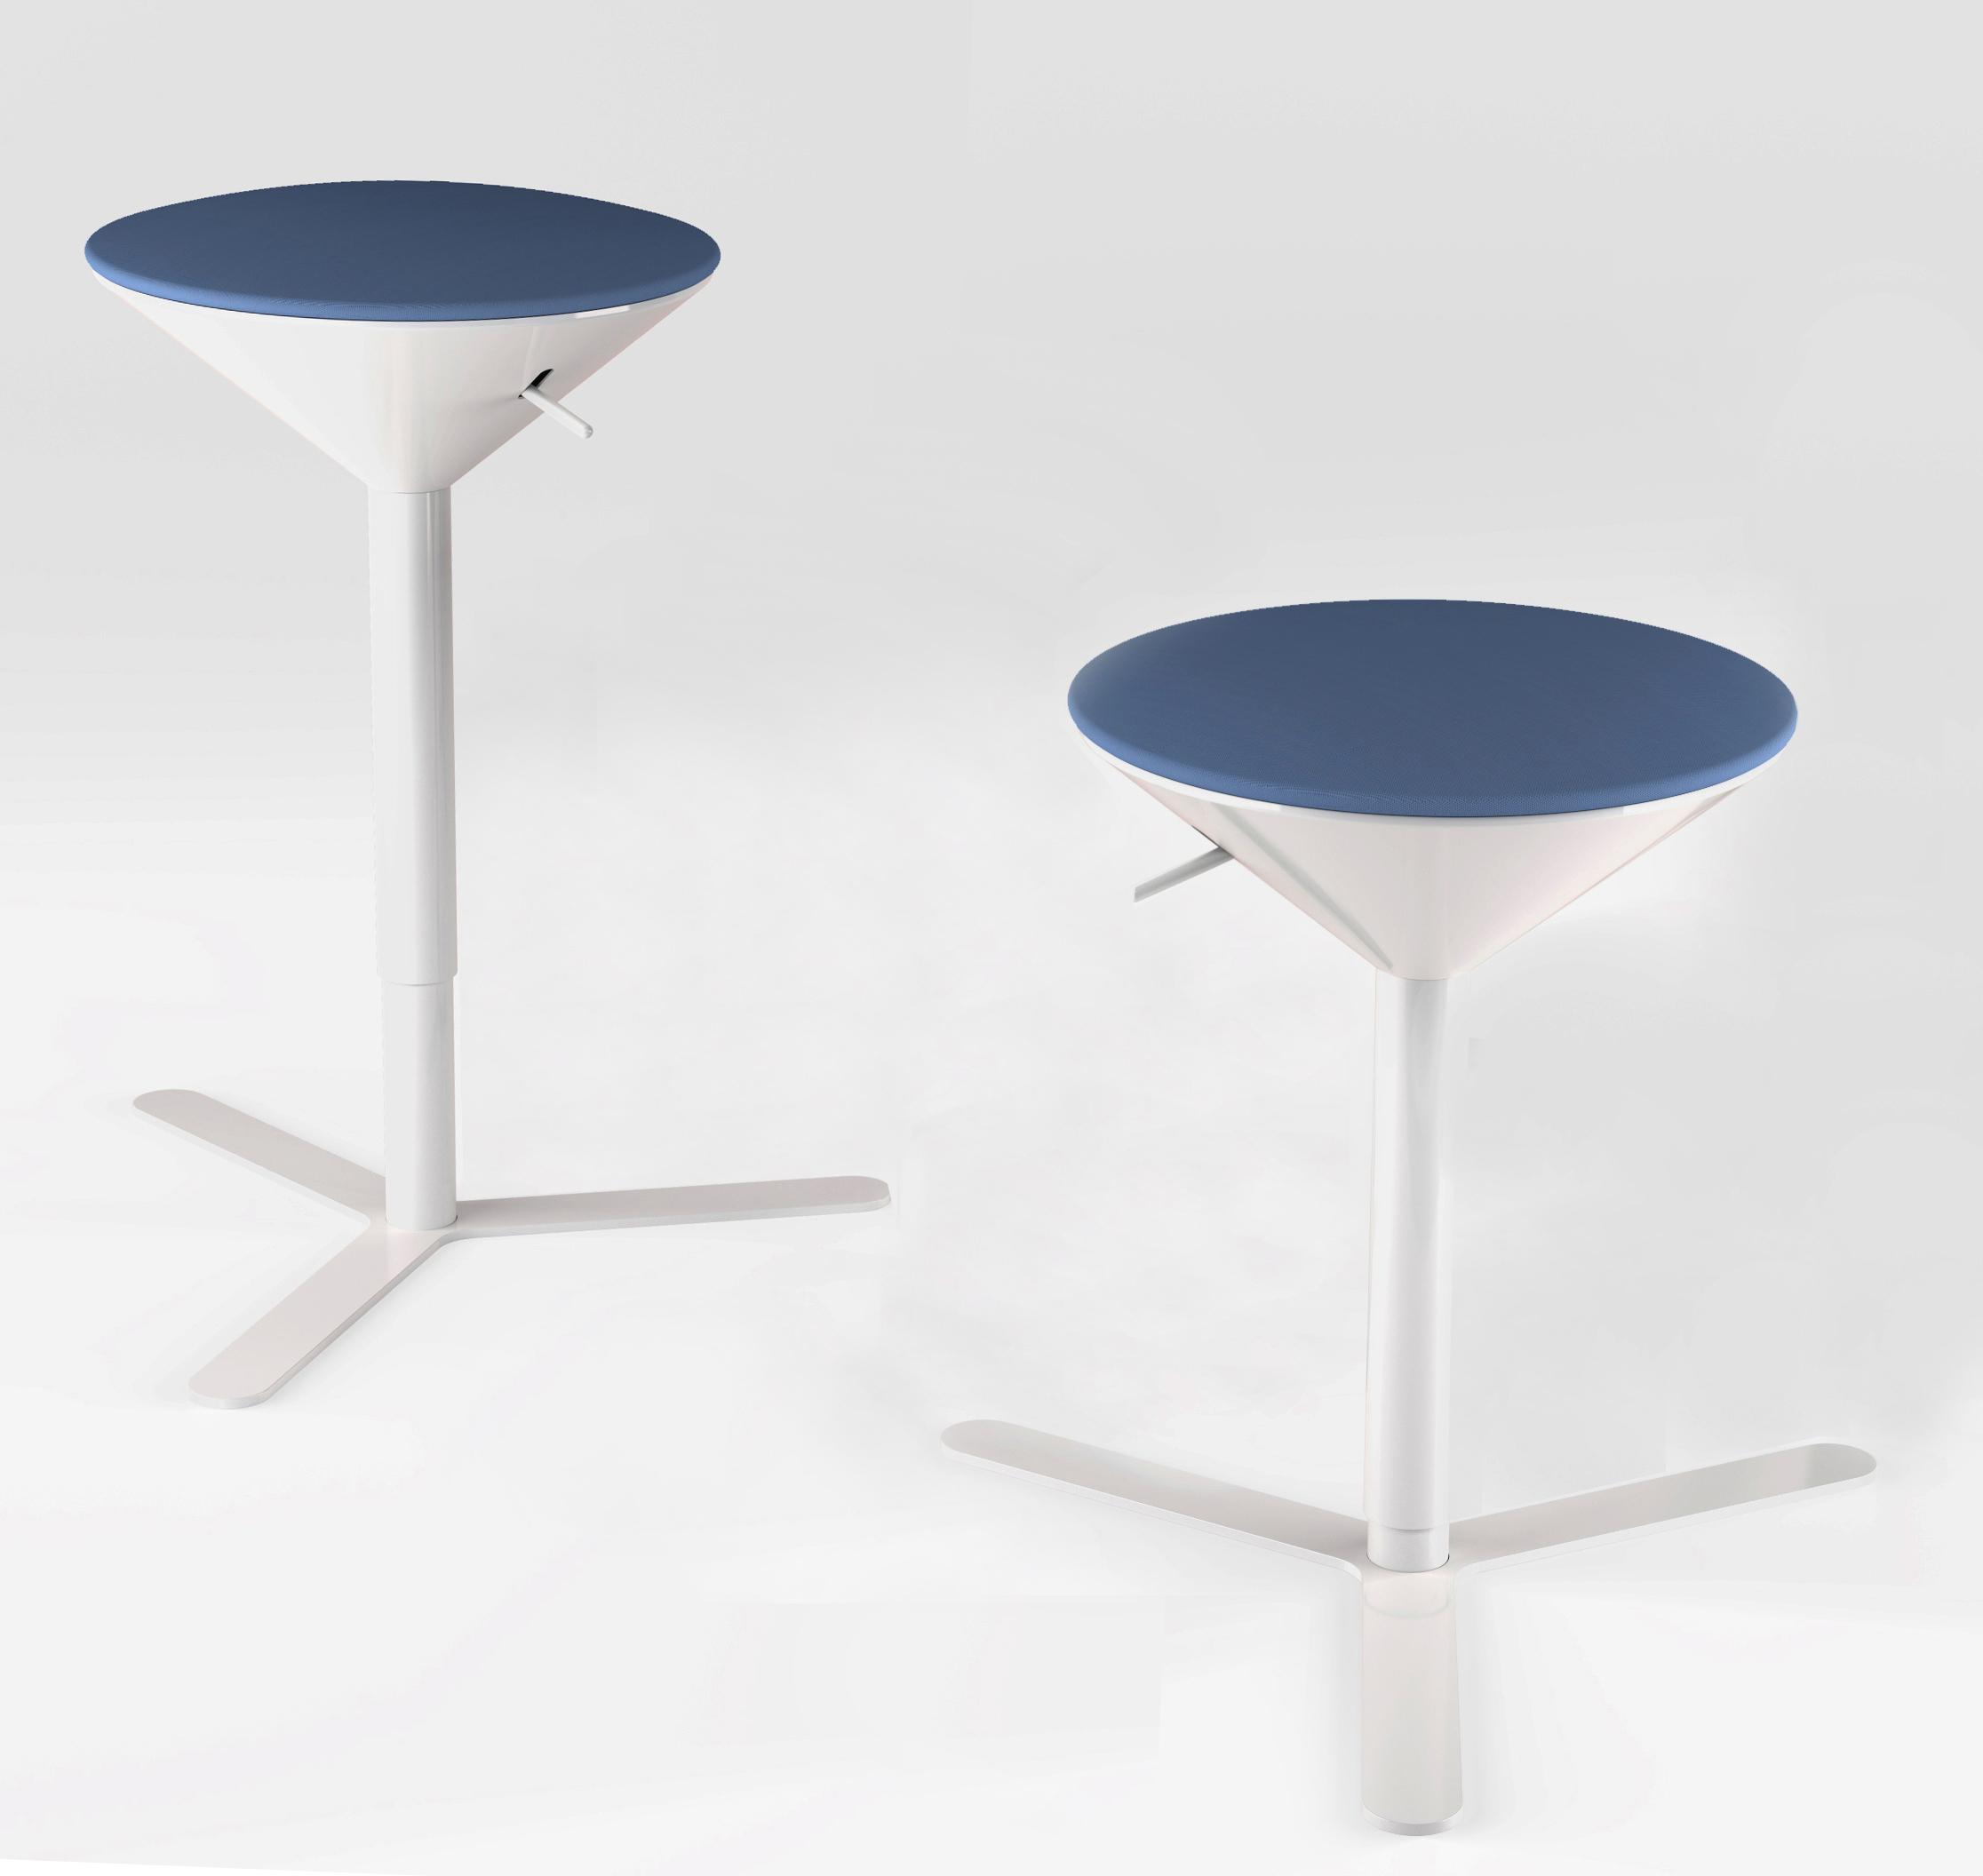 06S_Estel_Comfort&Relax_Chairs&Stool_Cono